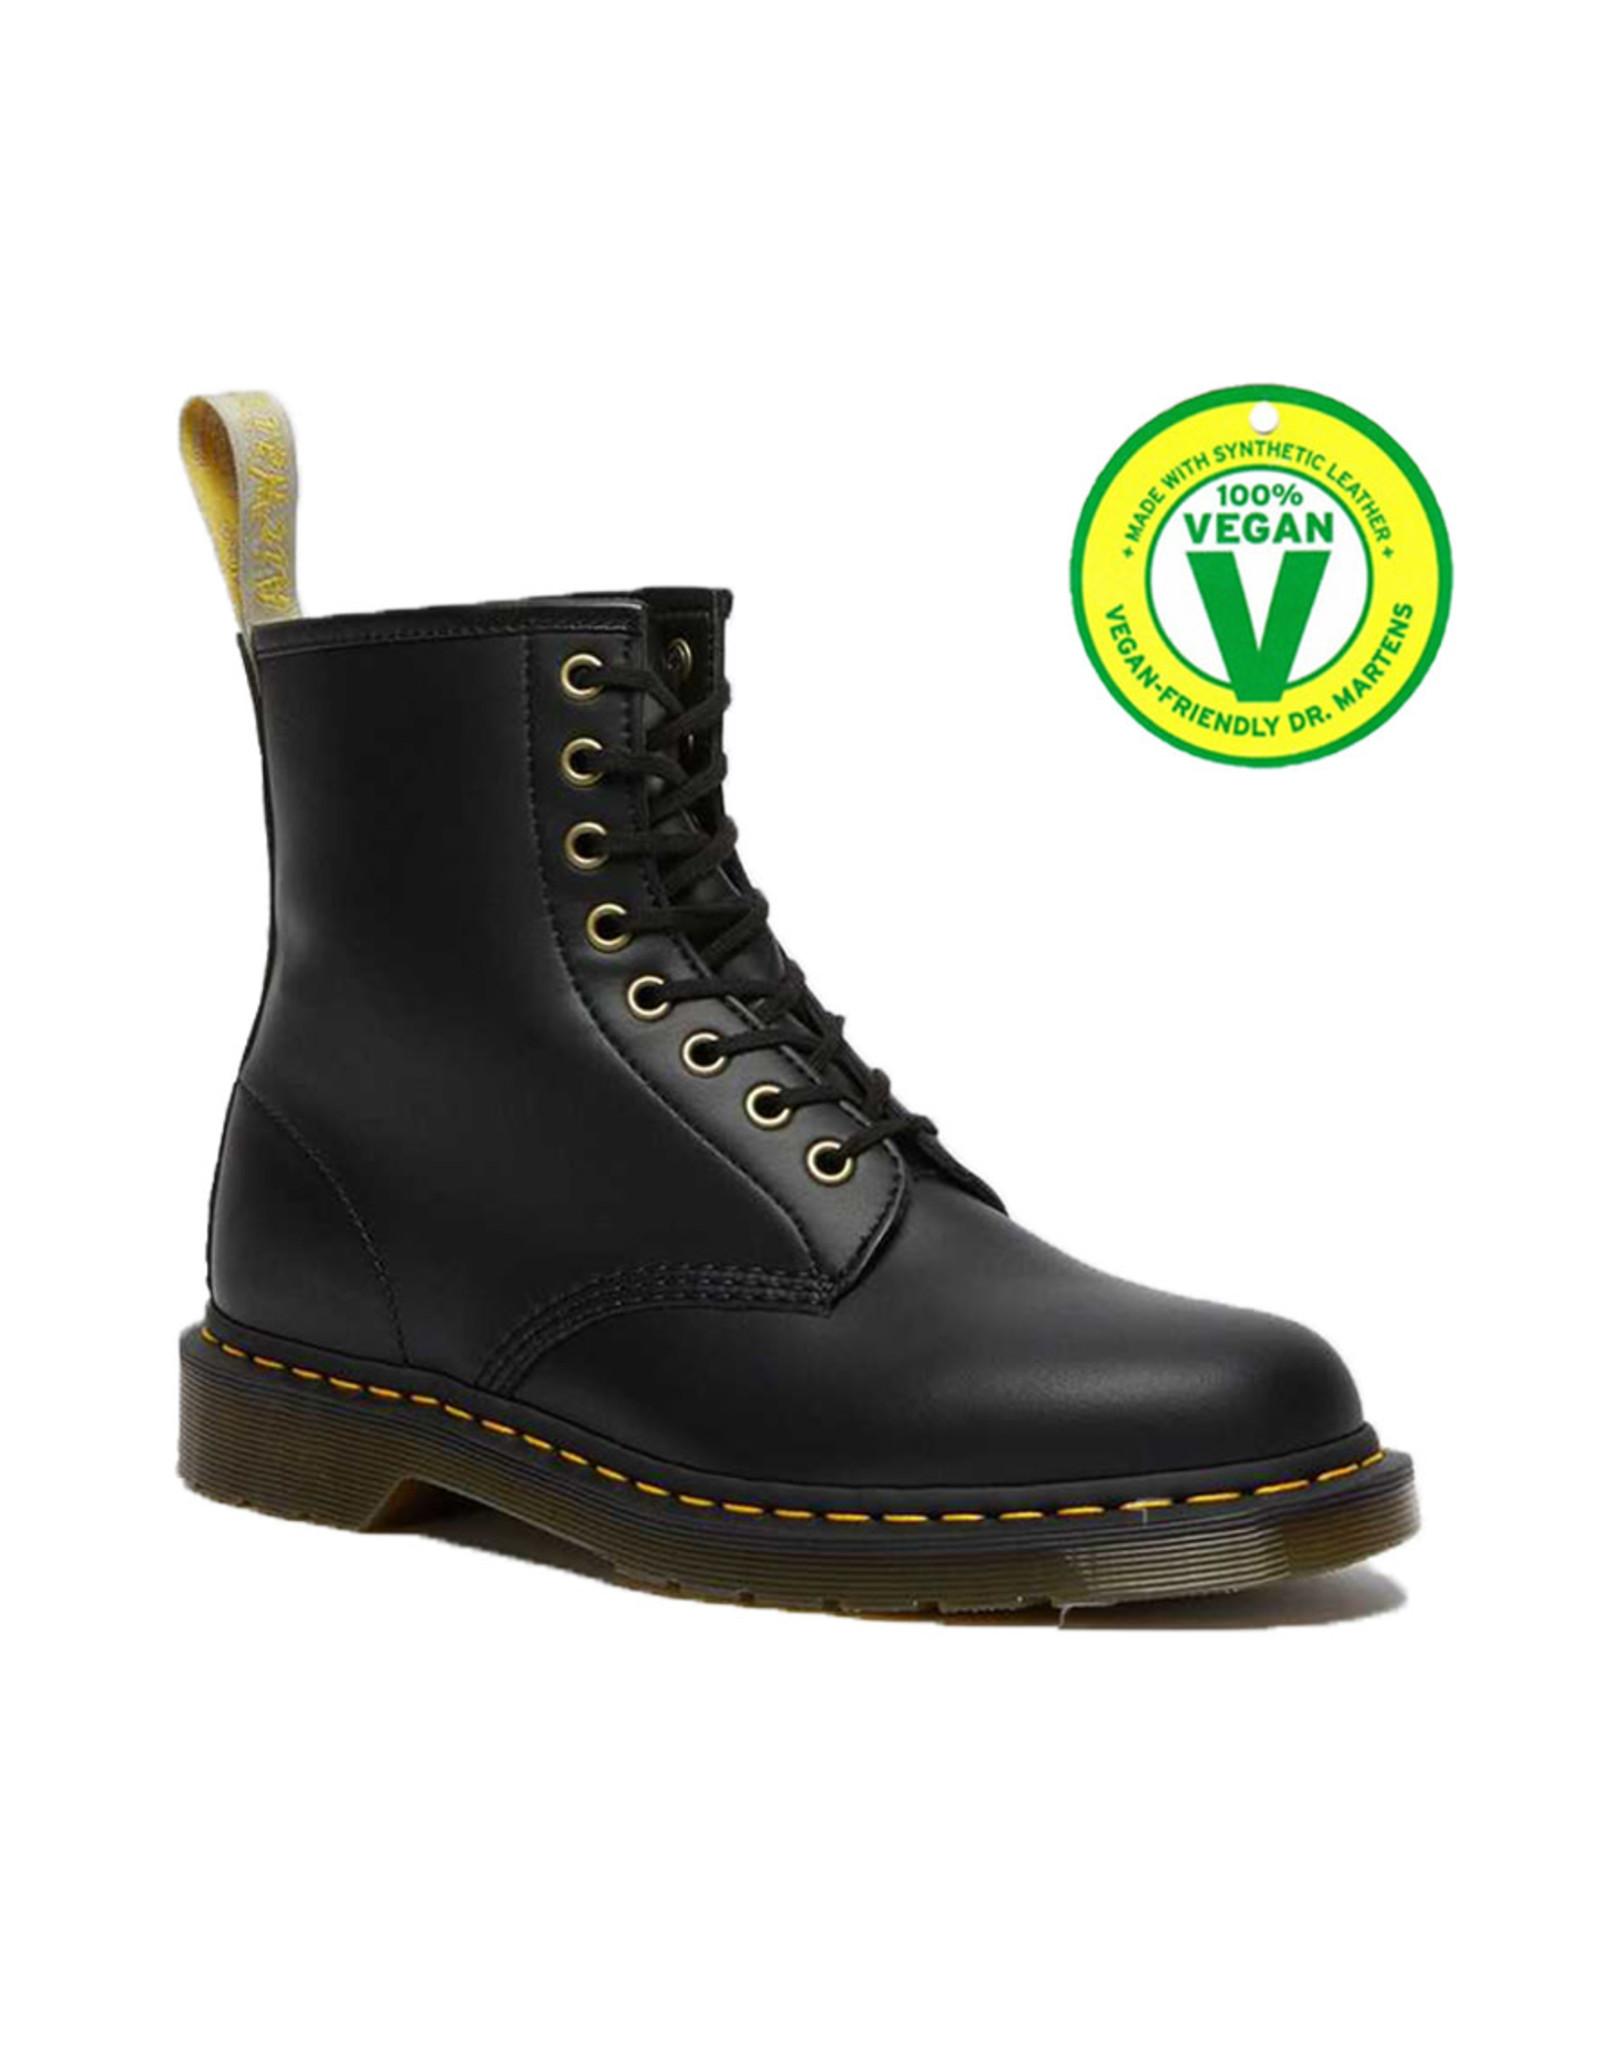 DR. MARTENS VEGAN 1460 BLACK FELIX RUB OFF 815VEB-R14045001